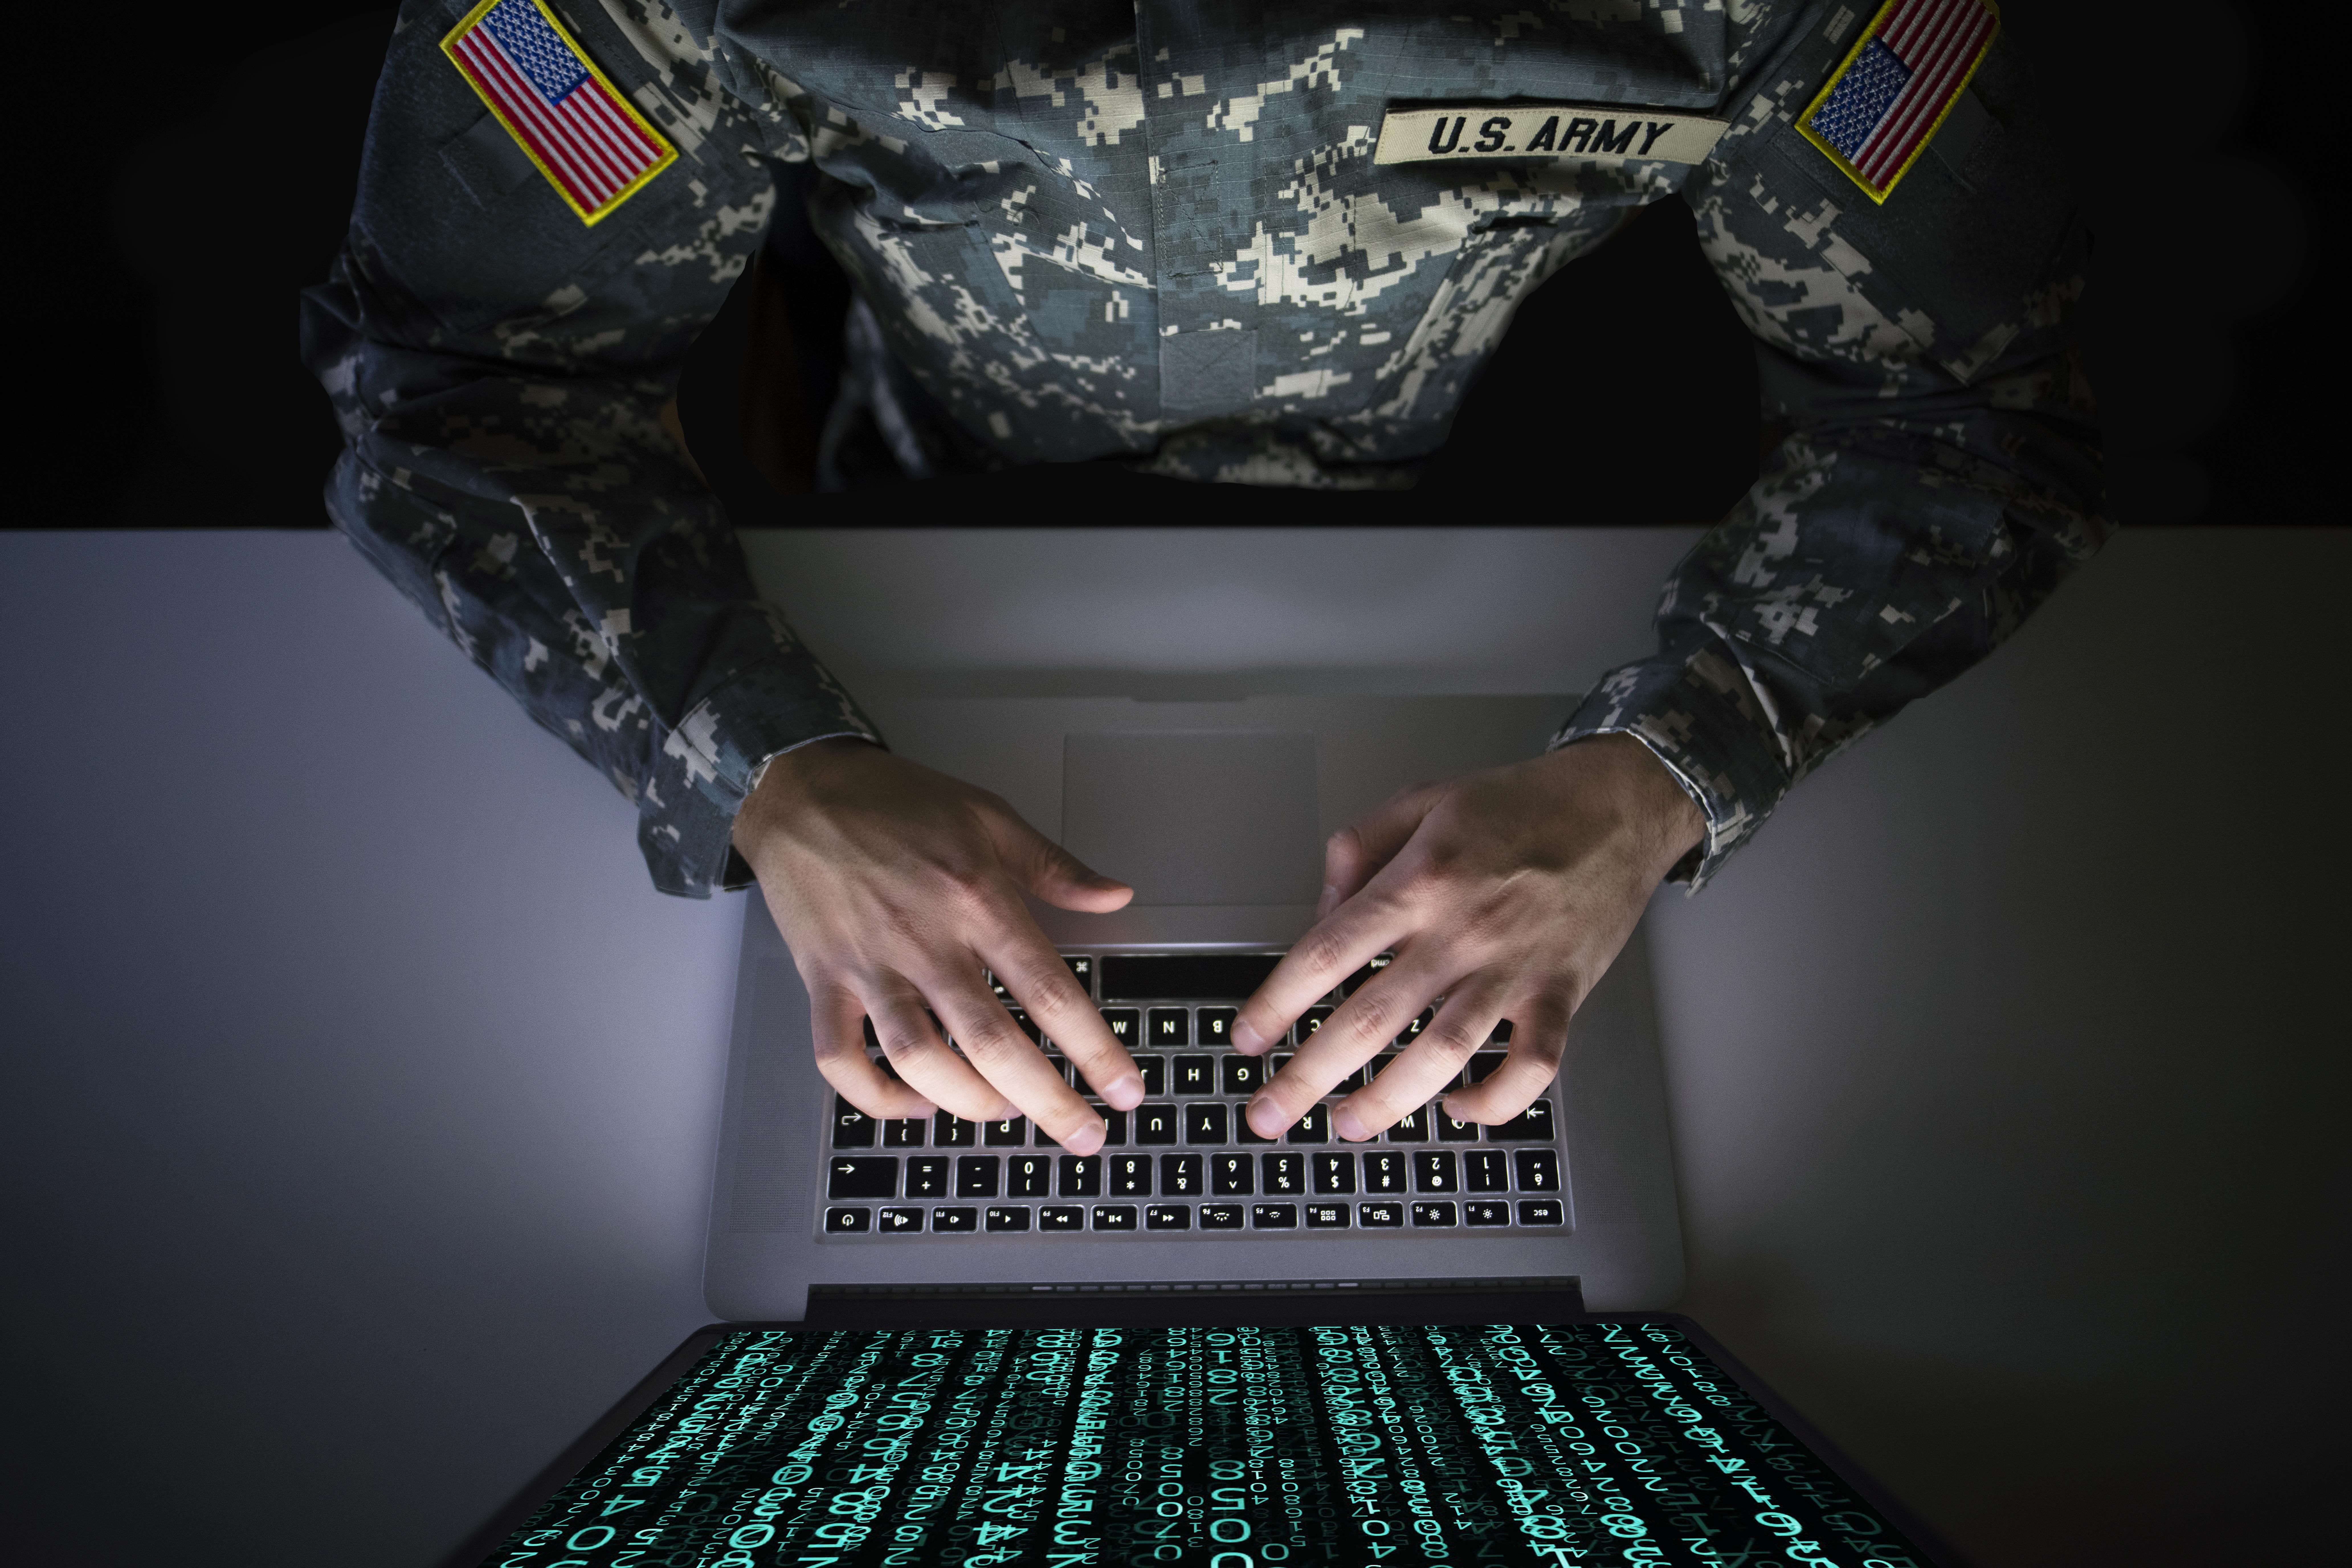 MilitaryCyberAttack